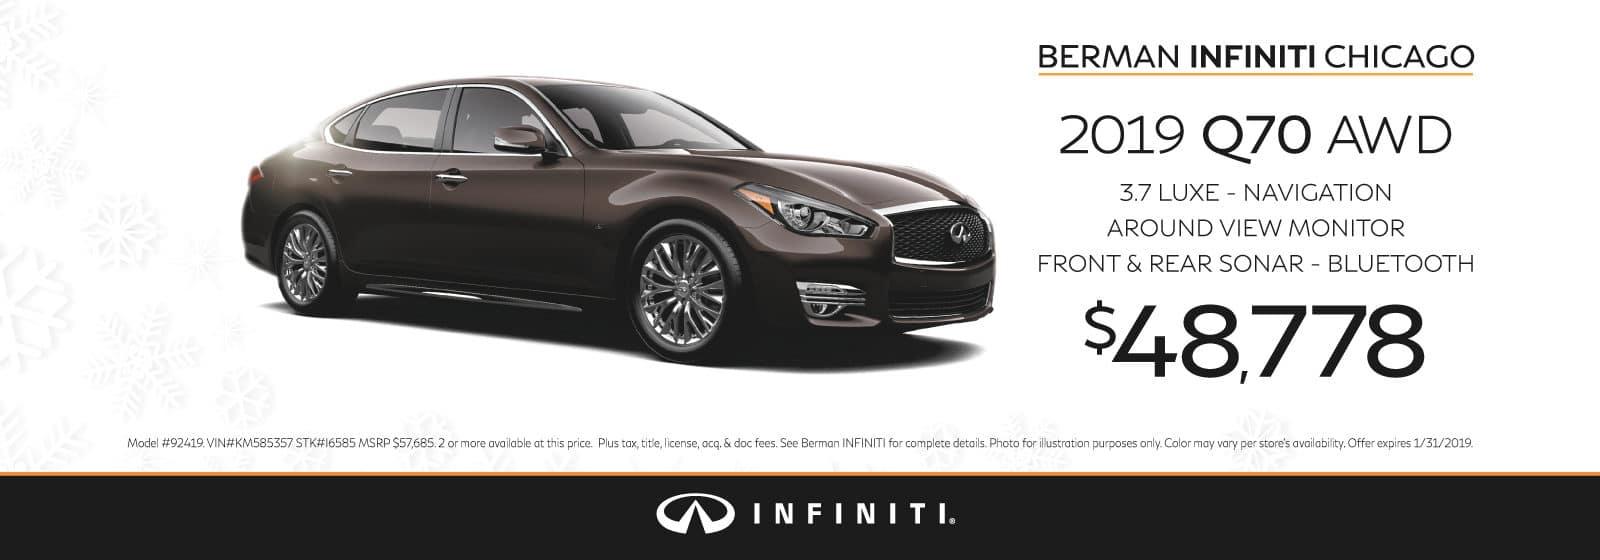 New 2019 INFINITI Q70 January offer at Berman INFINITI Chicago!